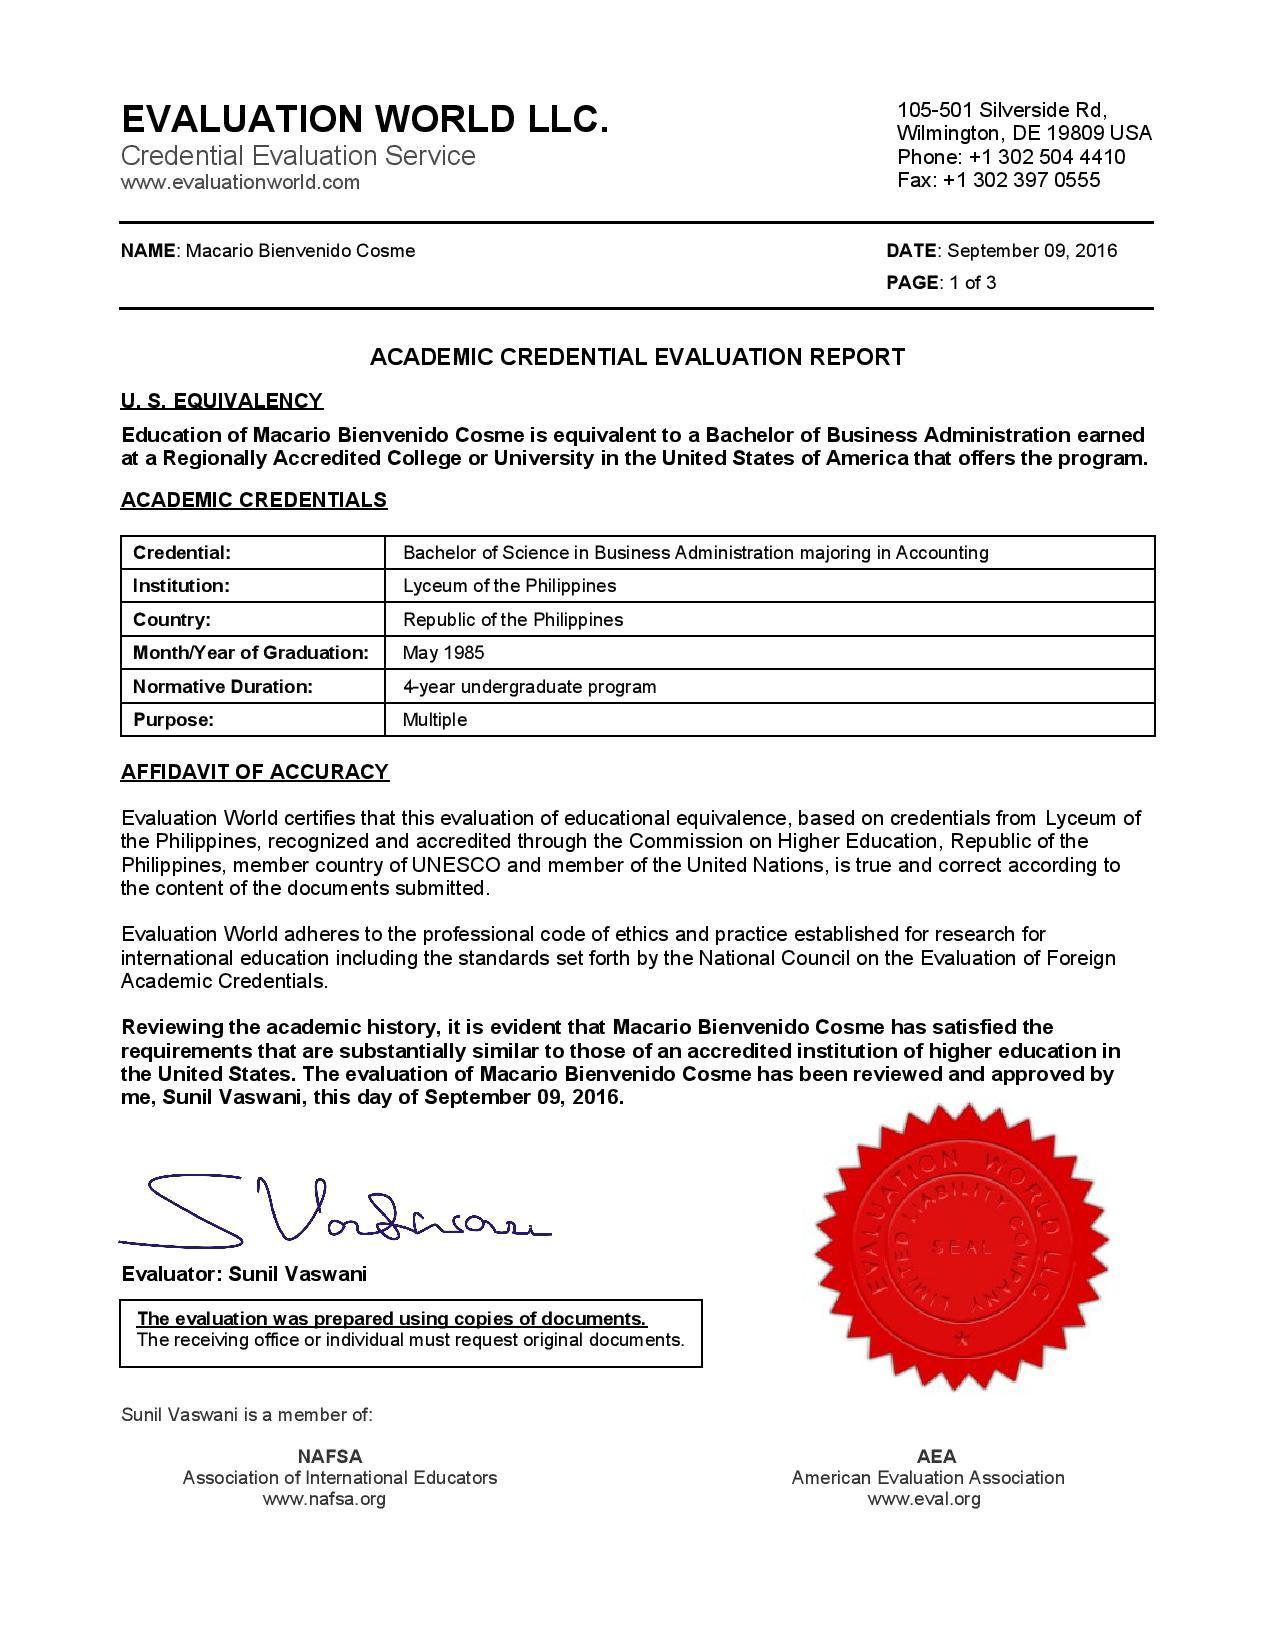 Credential Evaluation Report p1 - Lyceum Transcript of Records 09-10-16